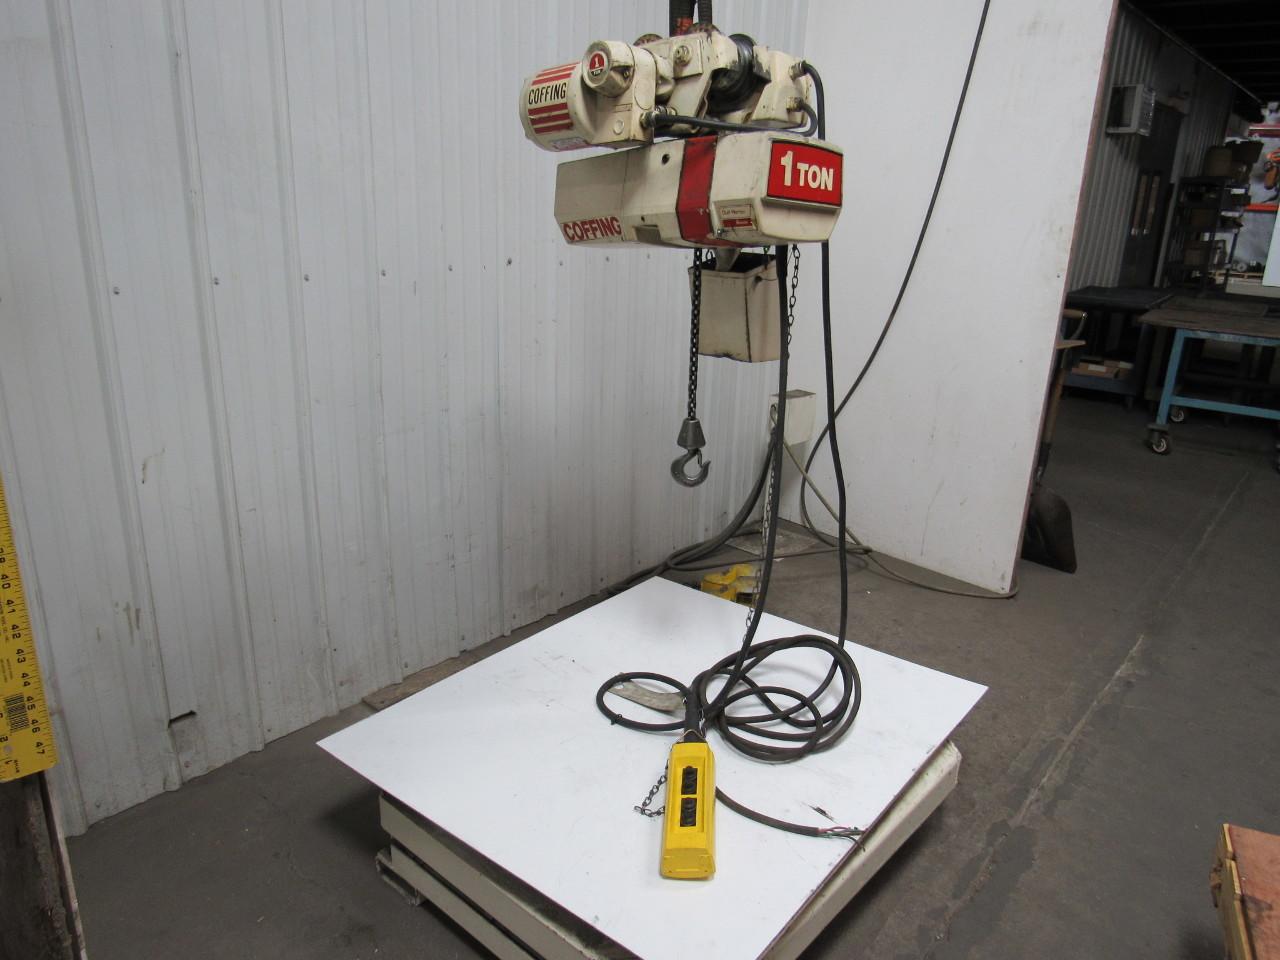 duff norton jf 863 1t coffing 1 ton 2sp electric chain hoist w duff norton jf 863 1t coffing 1 ton 2sp electric chain hoist